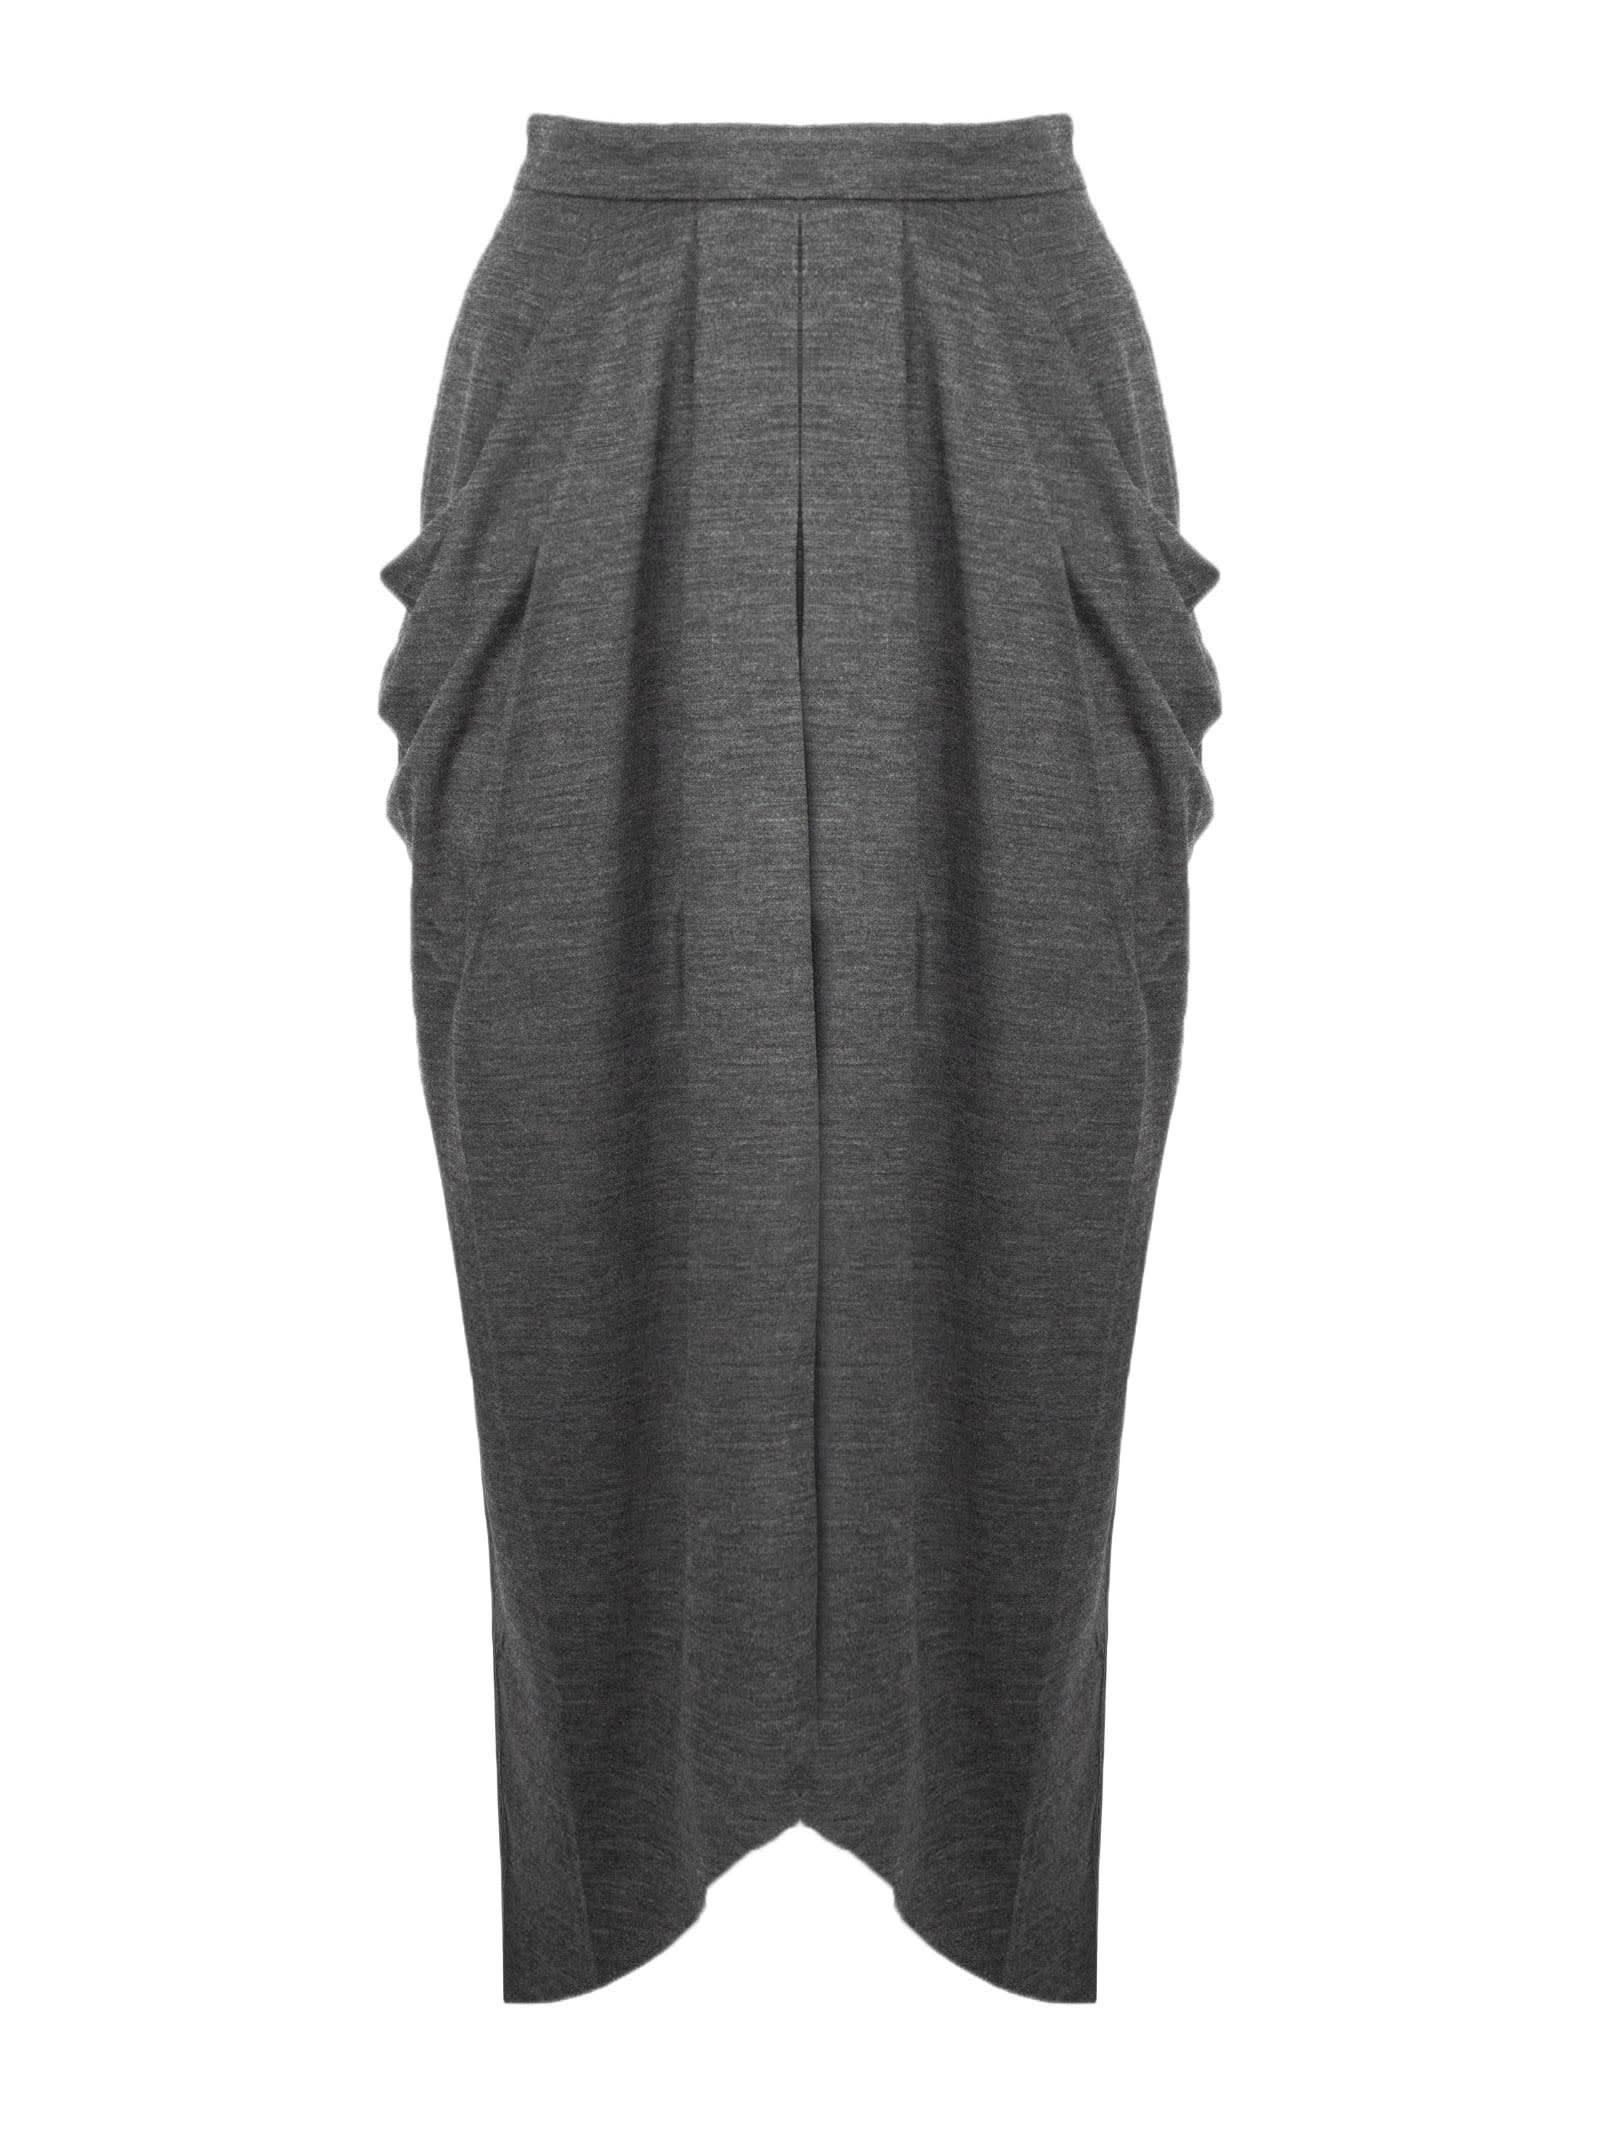 Isabel Marant Anthracite Grey Virgin Wool Skirt In Grigio